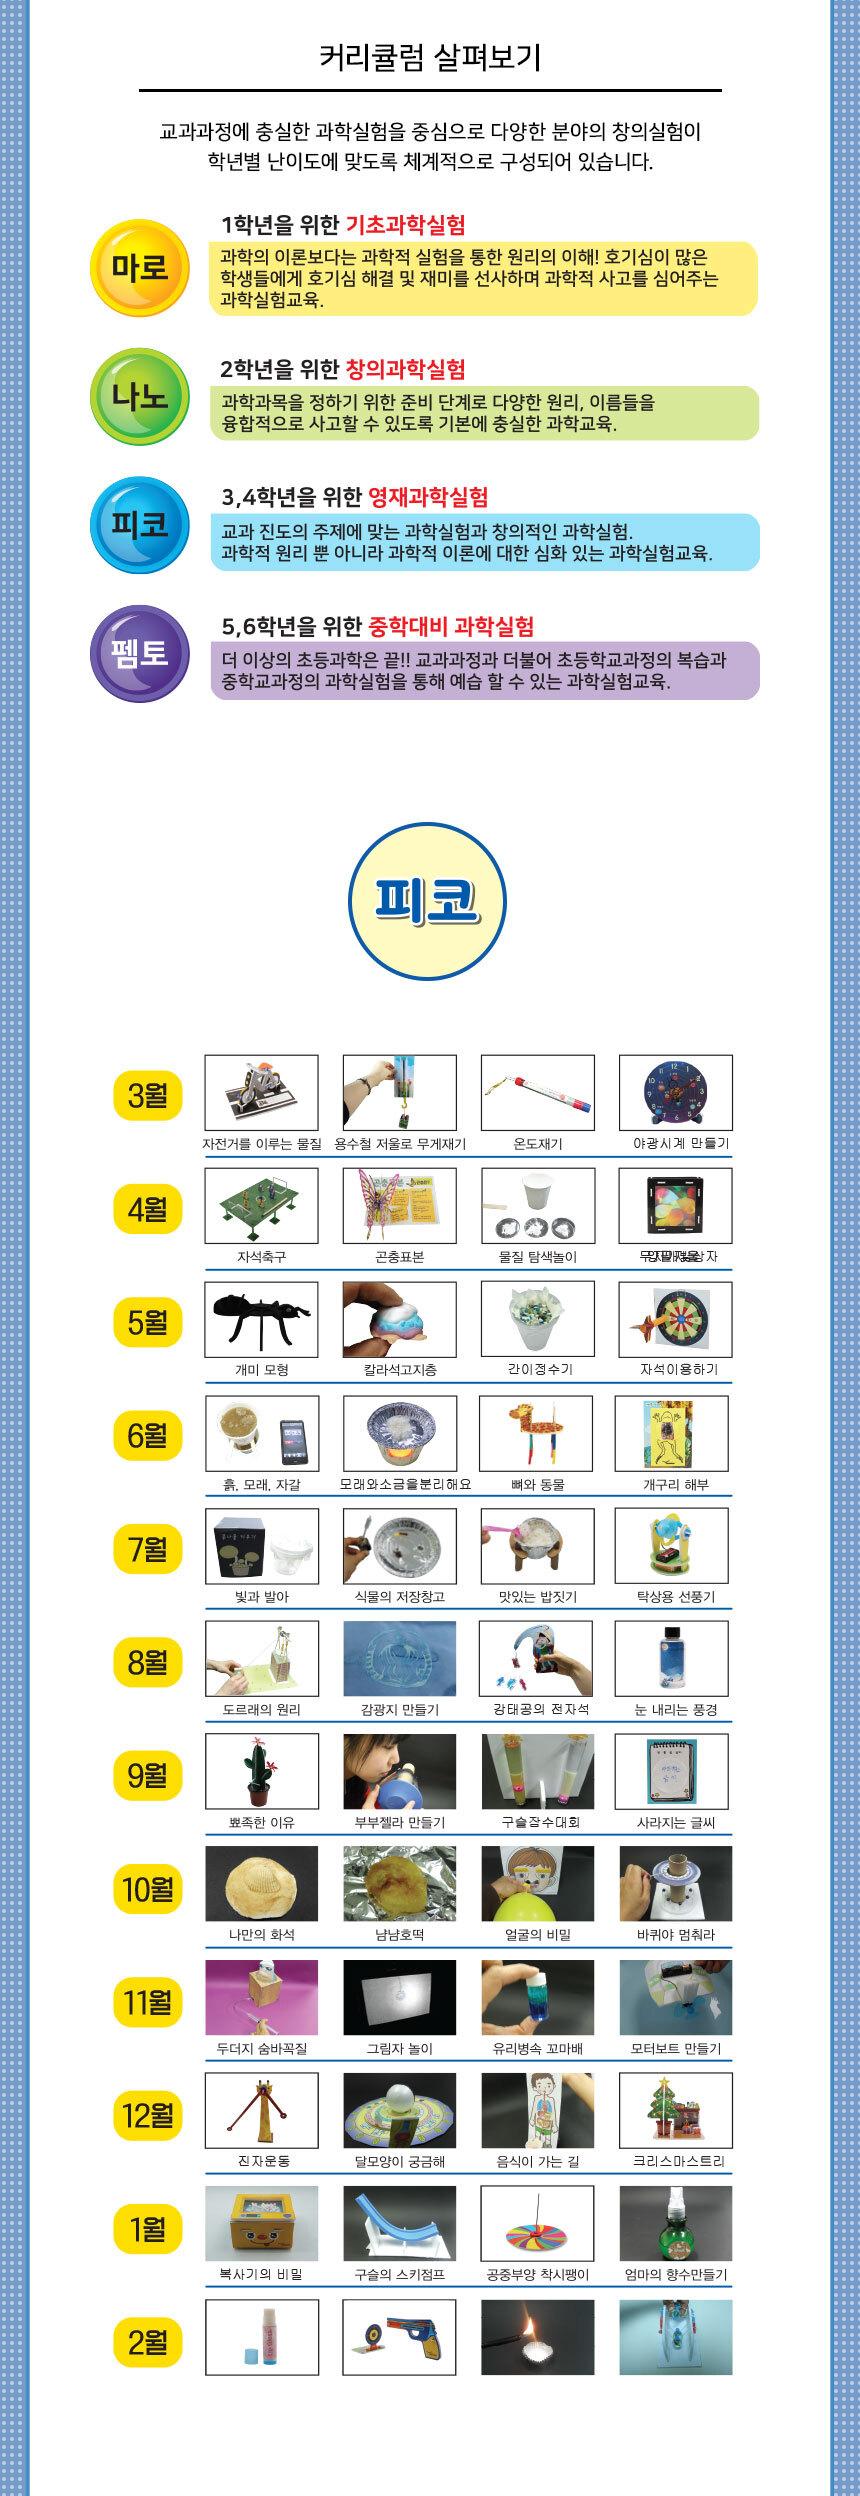 pa_t_16_new.jpg